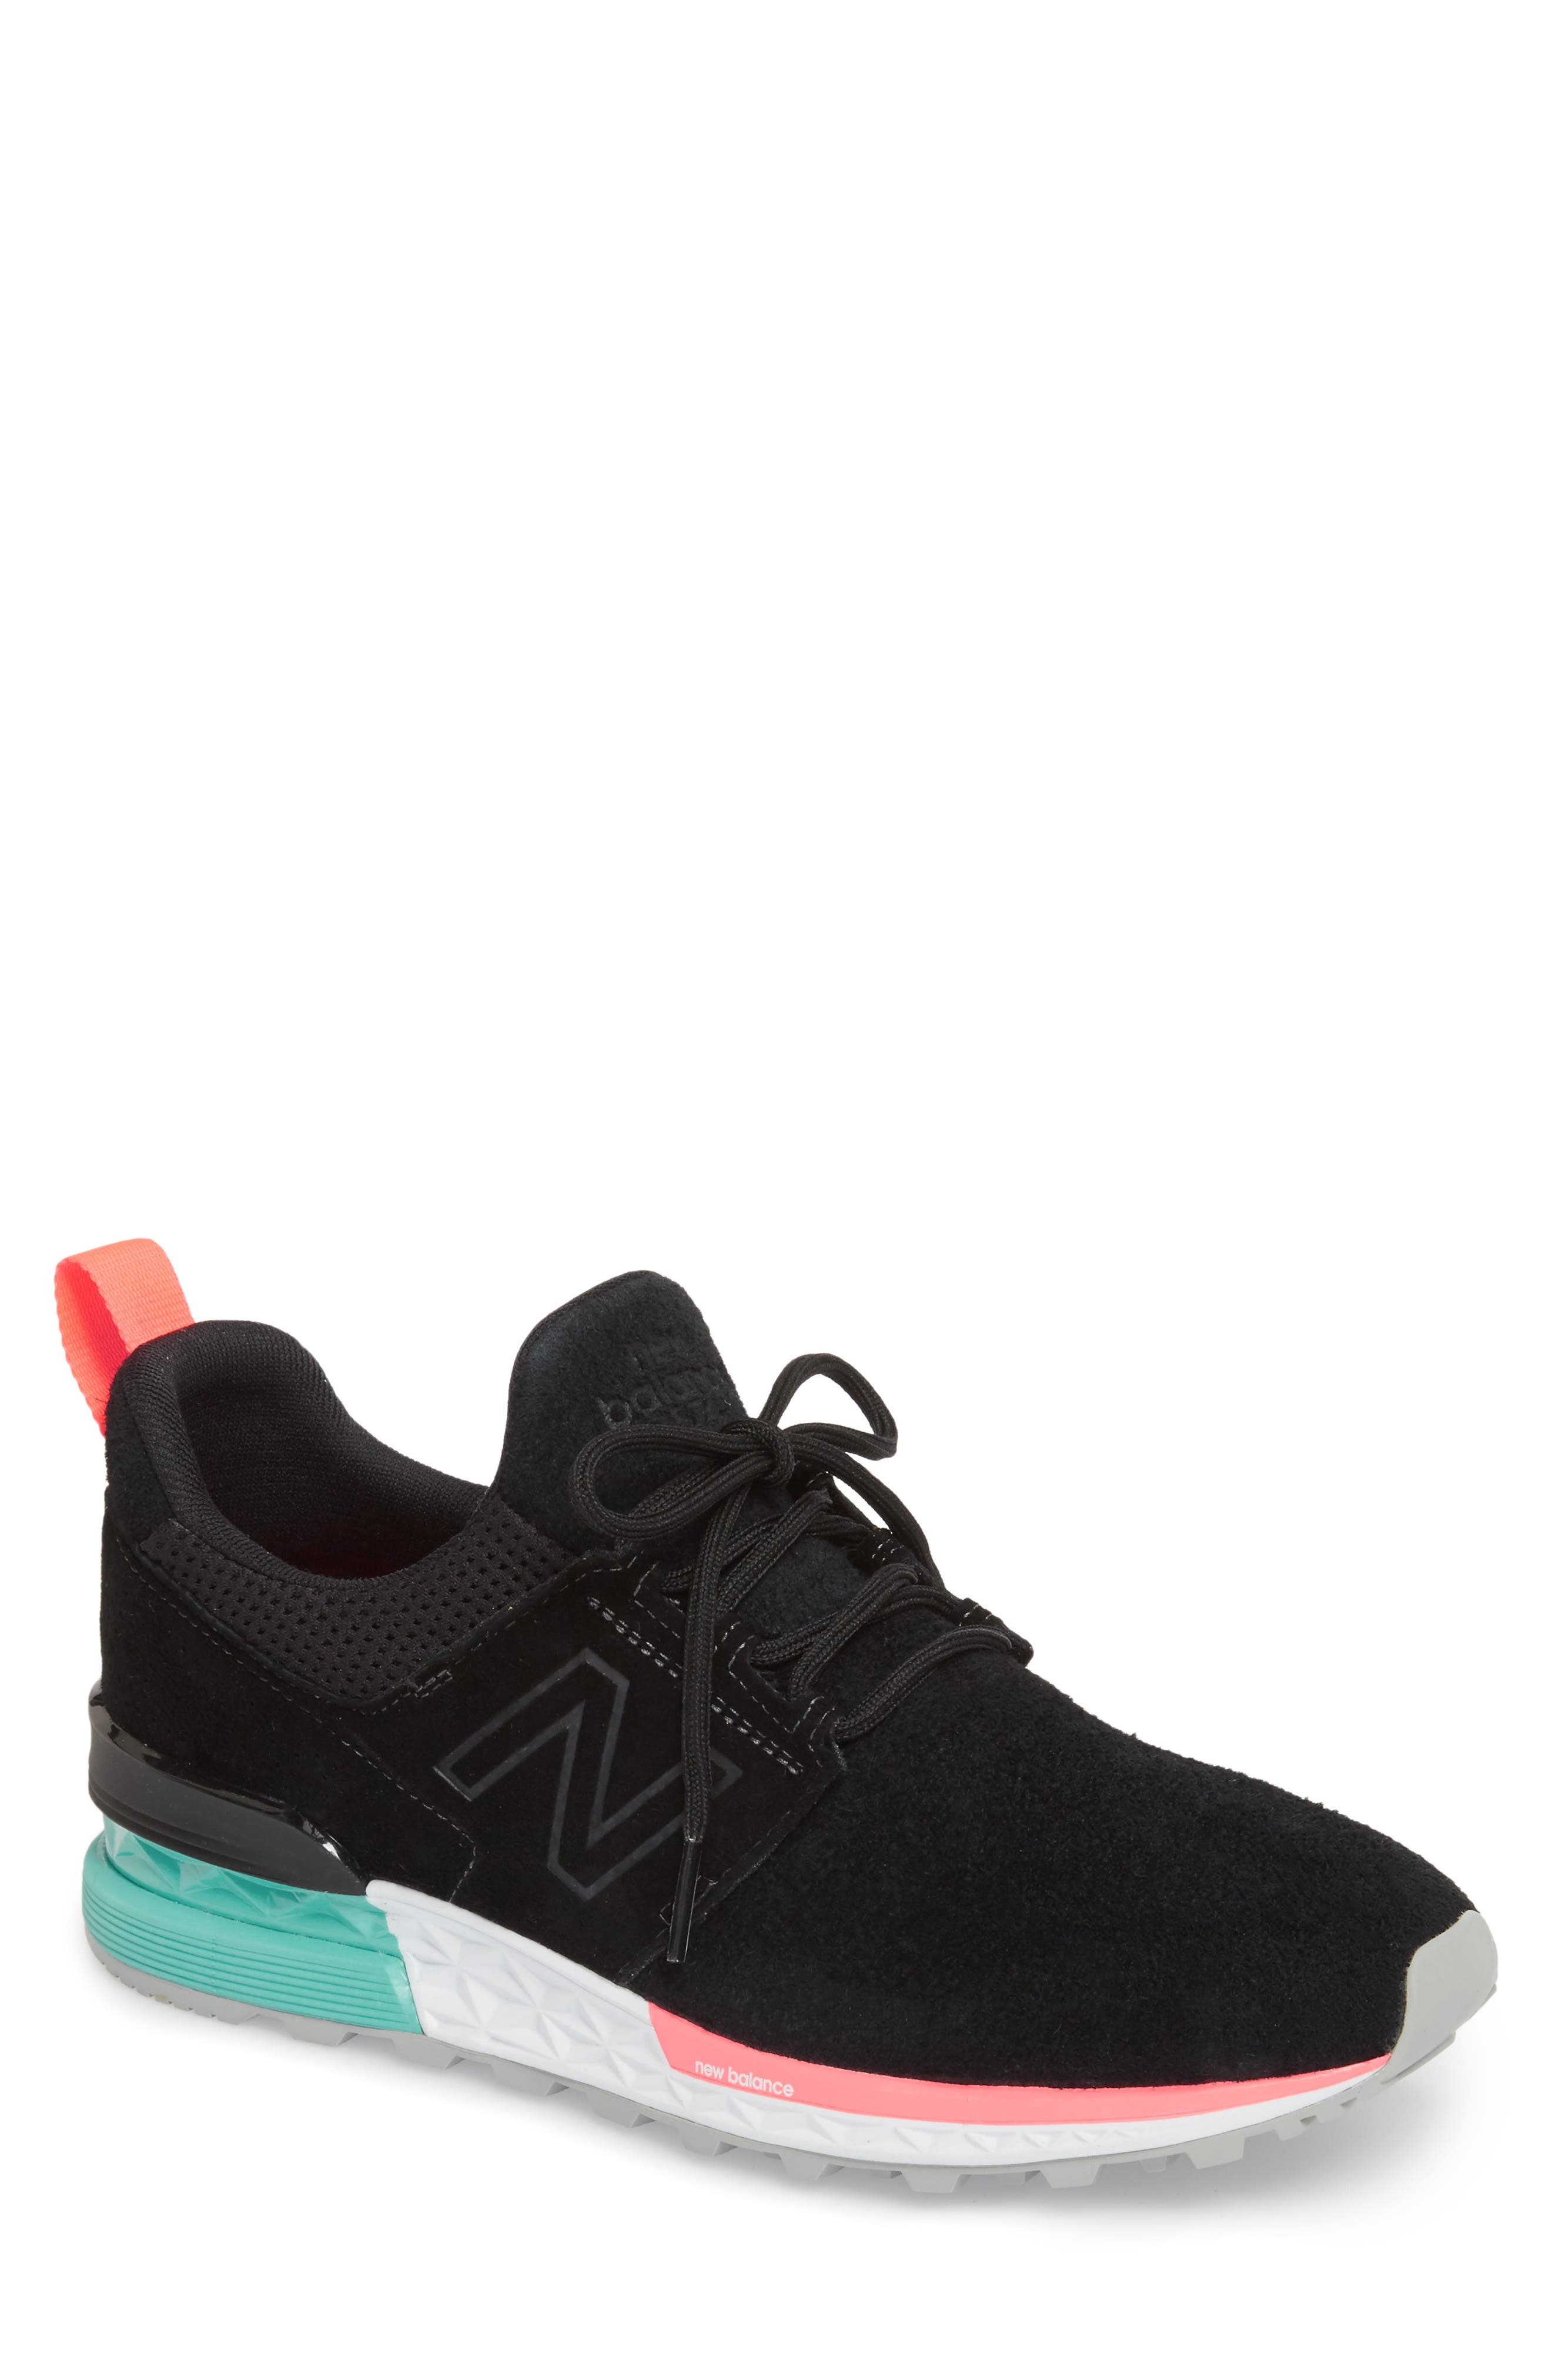 574 Sport Sneaker,                         Main,                         color,